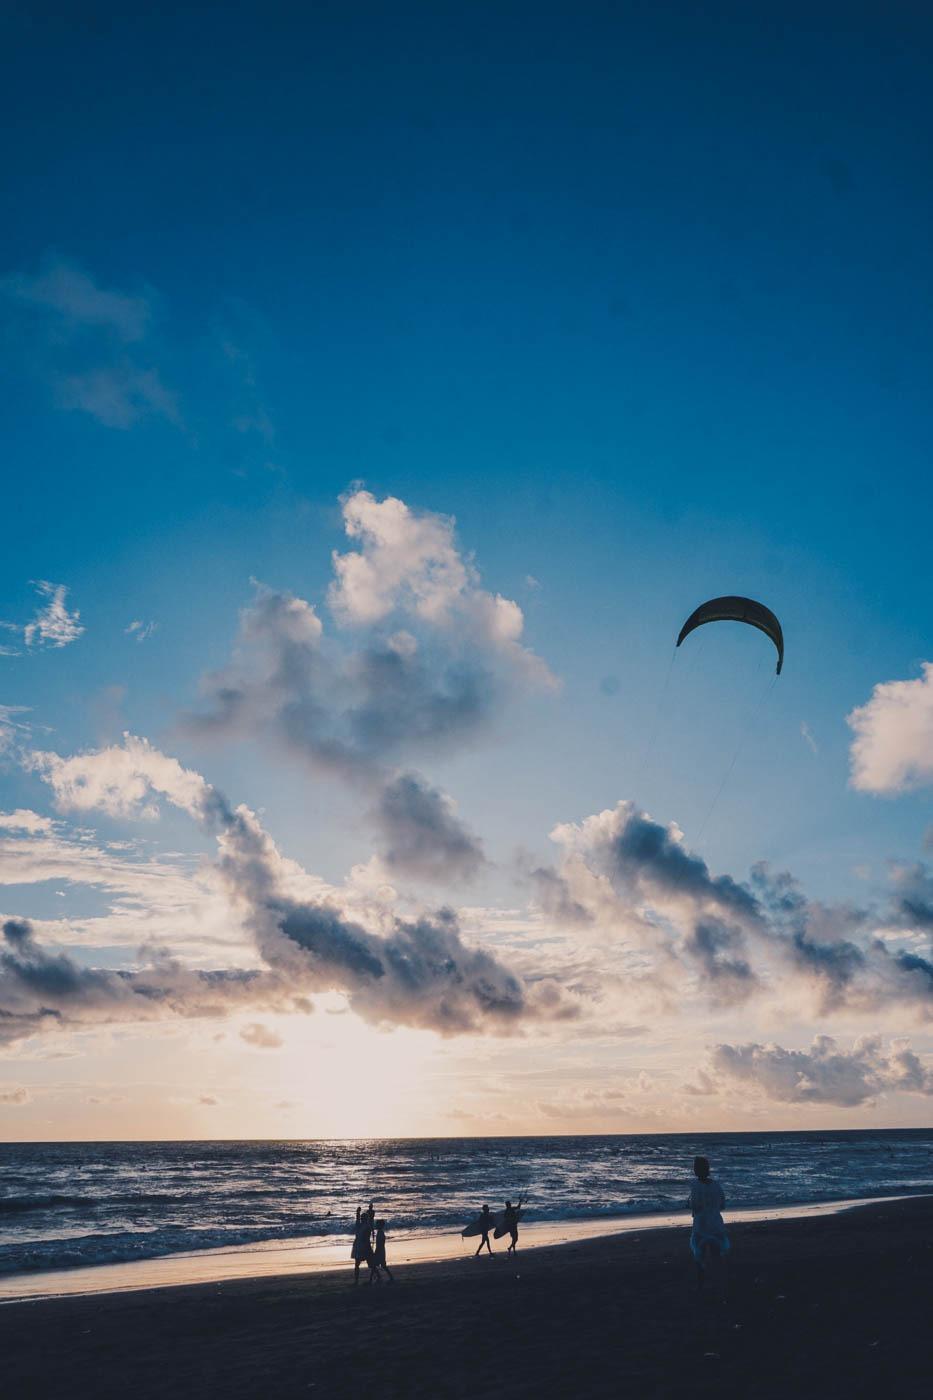 Kitesurfers on the beach in Canggu